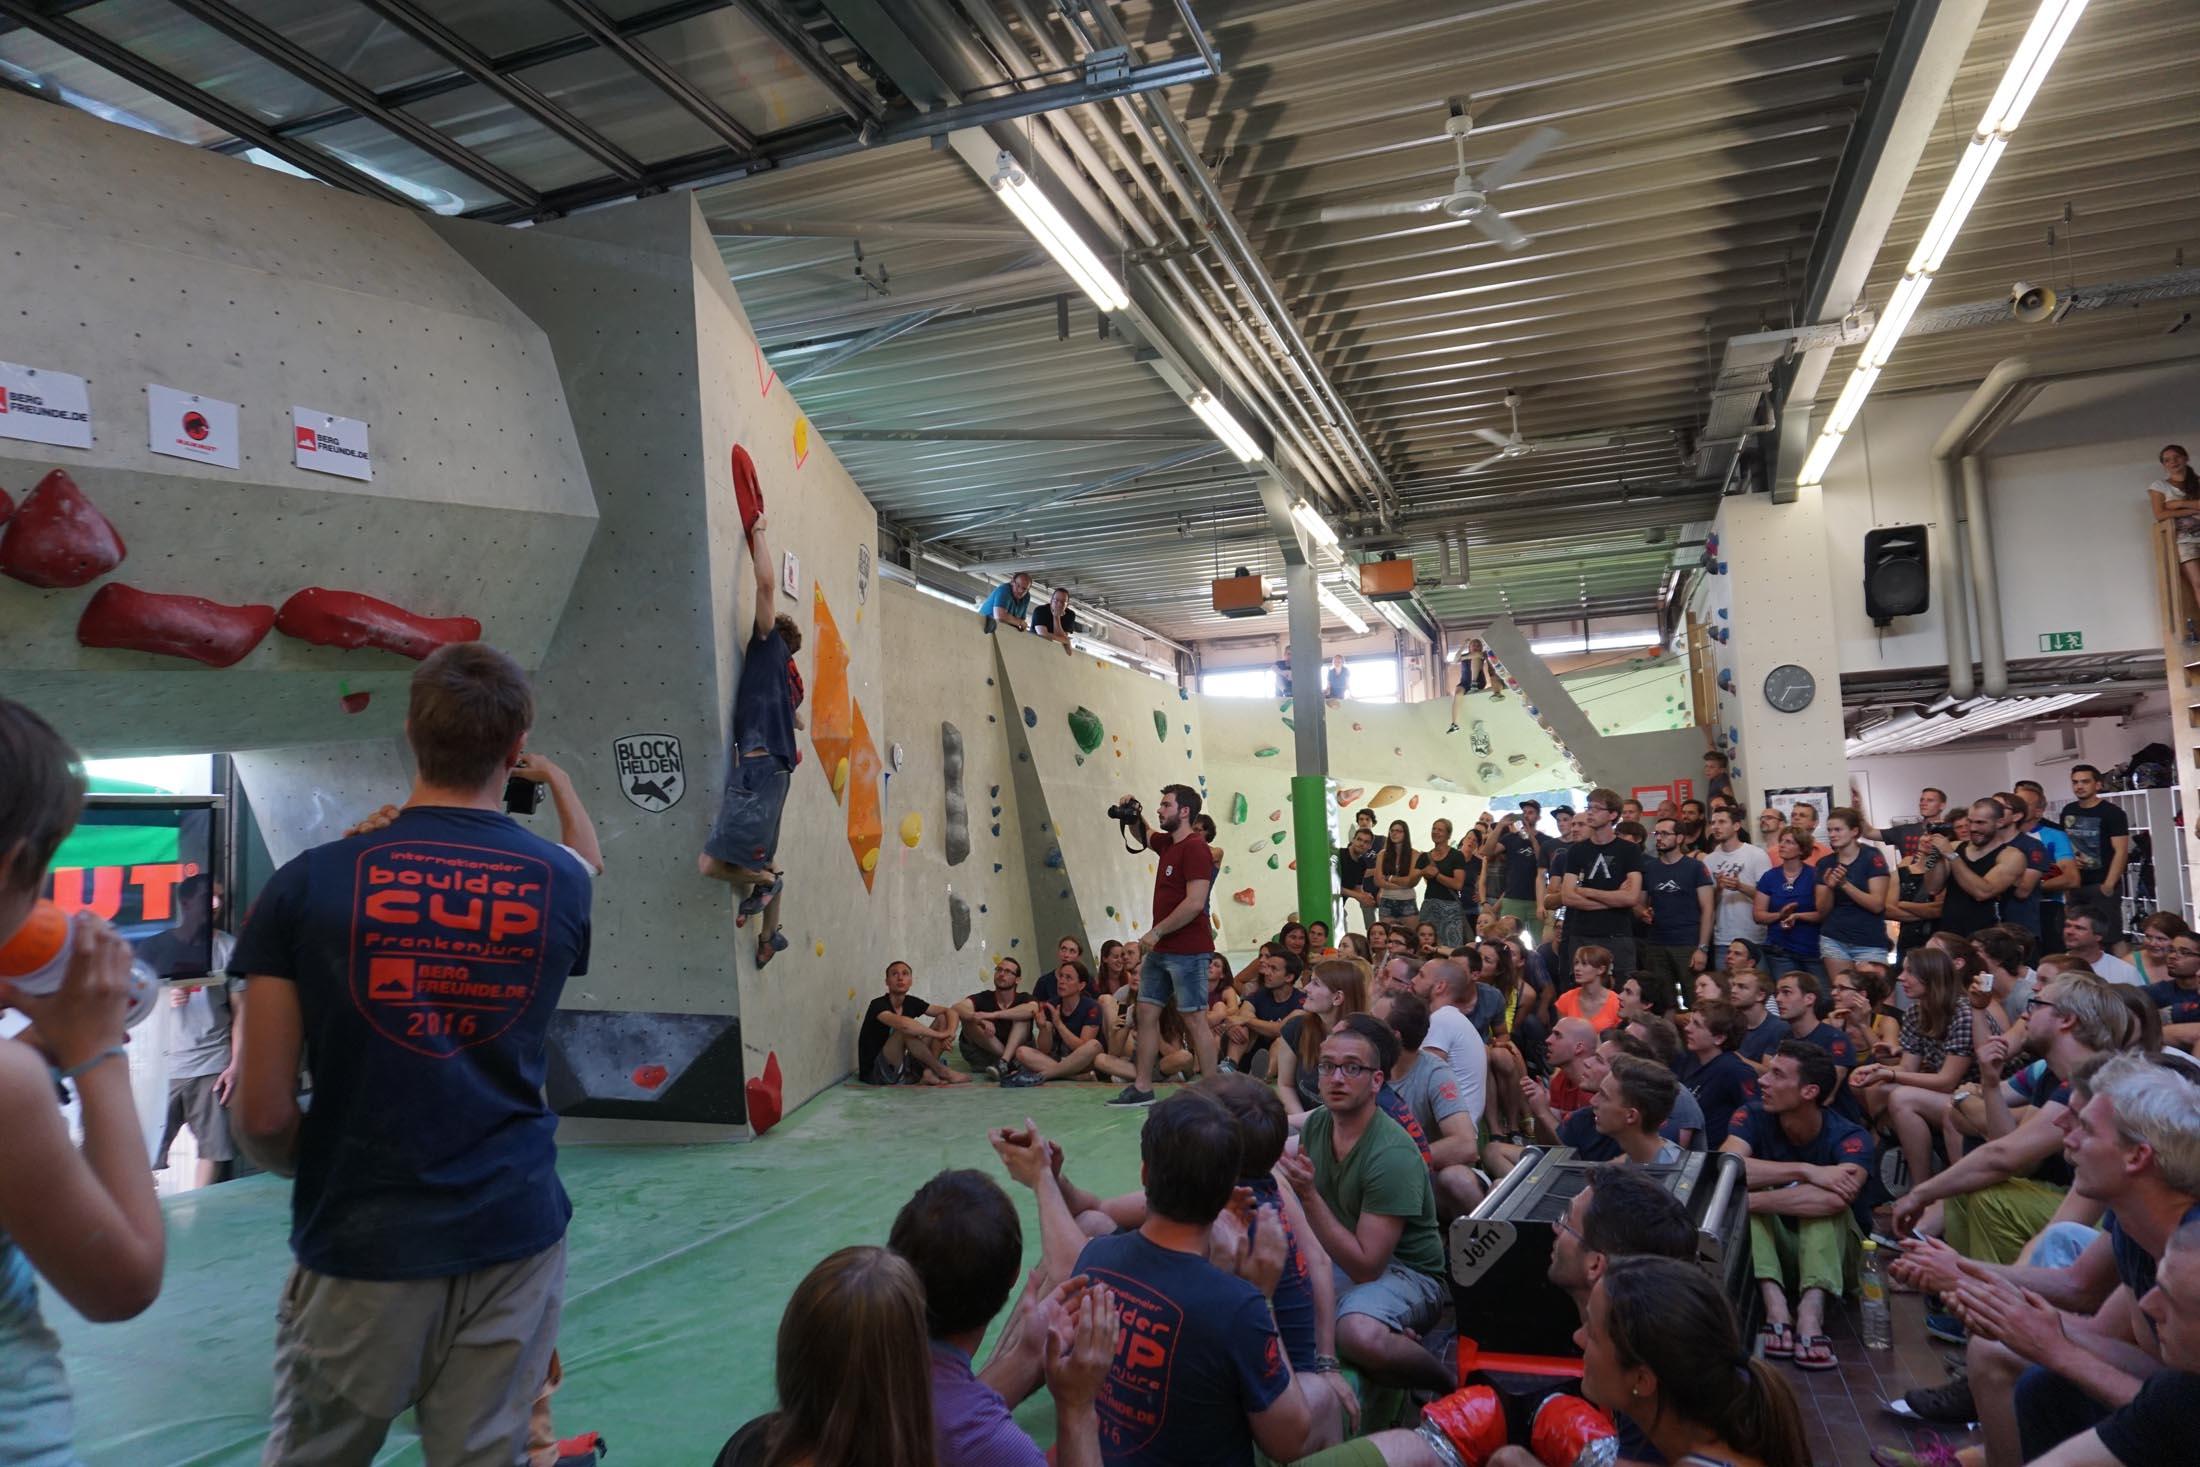 Finale, internationaler bouldercup Frankenjura 2016, BLOCKHELDEN Erlangen, Mammut, Bergfreunde.de, Boulderwettkampf07092016587